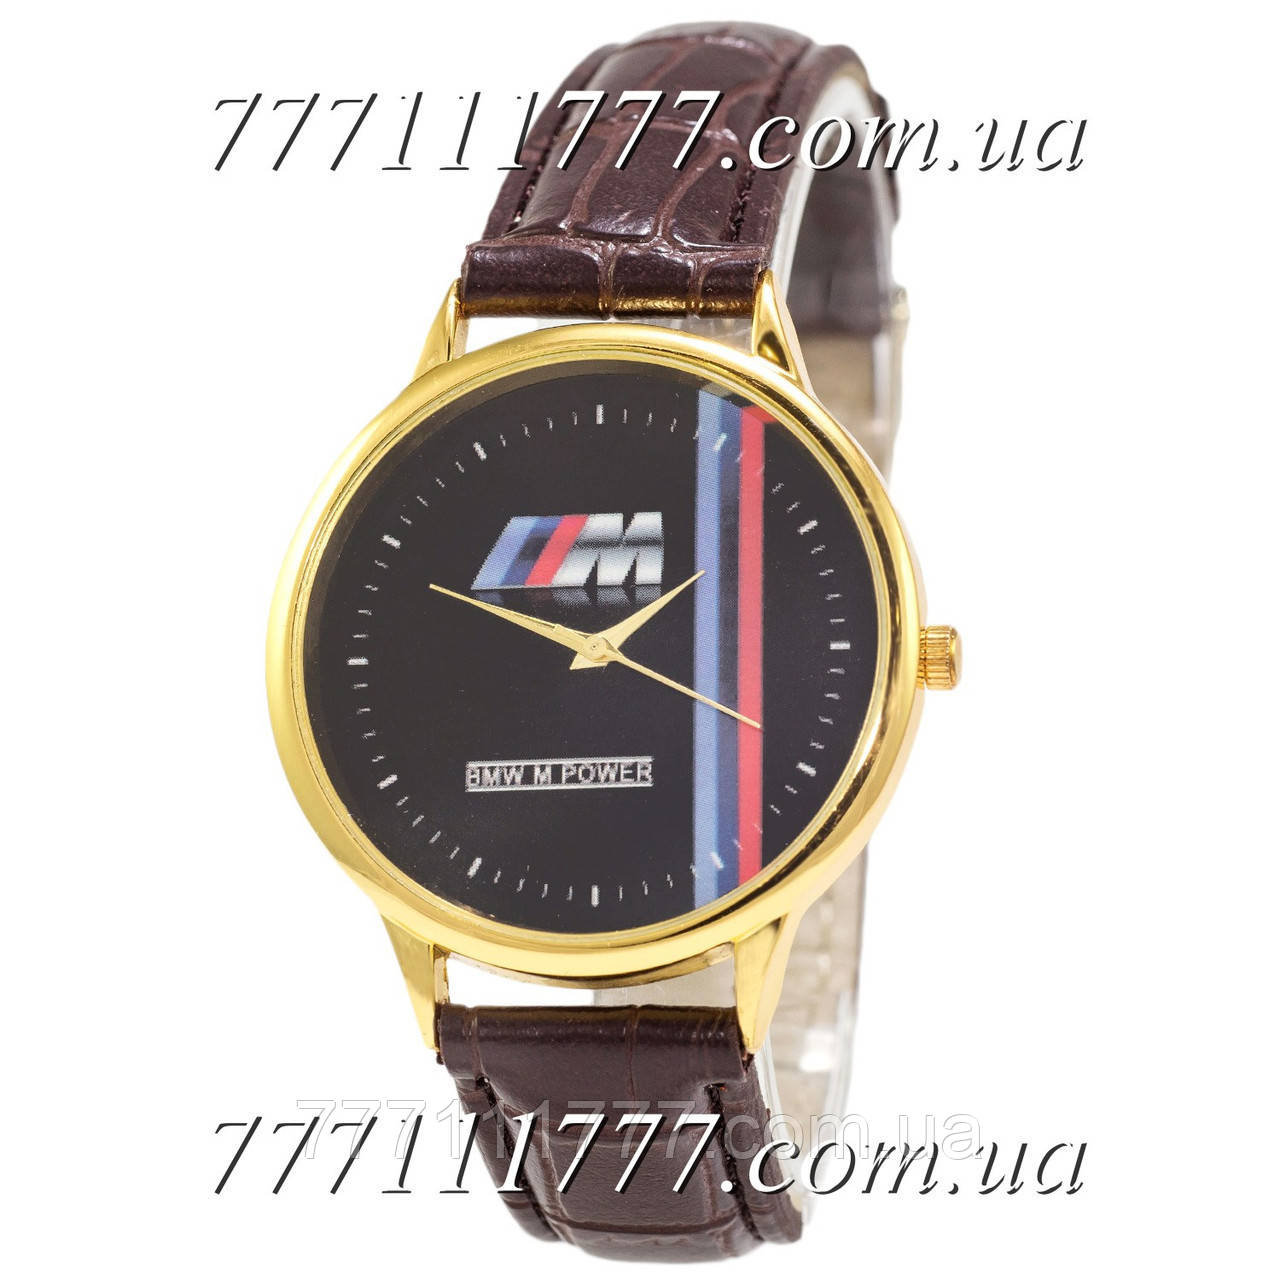 ce658230 Часы мужские наручные Украина BMW M Power m Gold-Brown: продажа ...